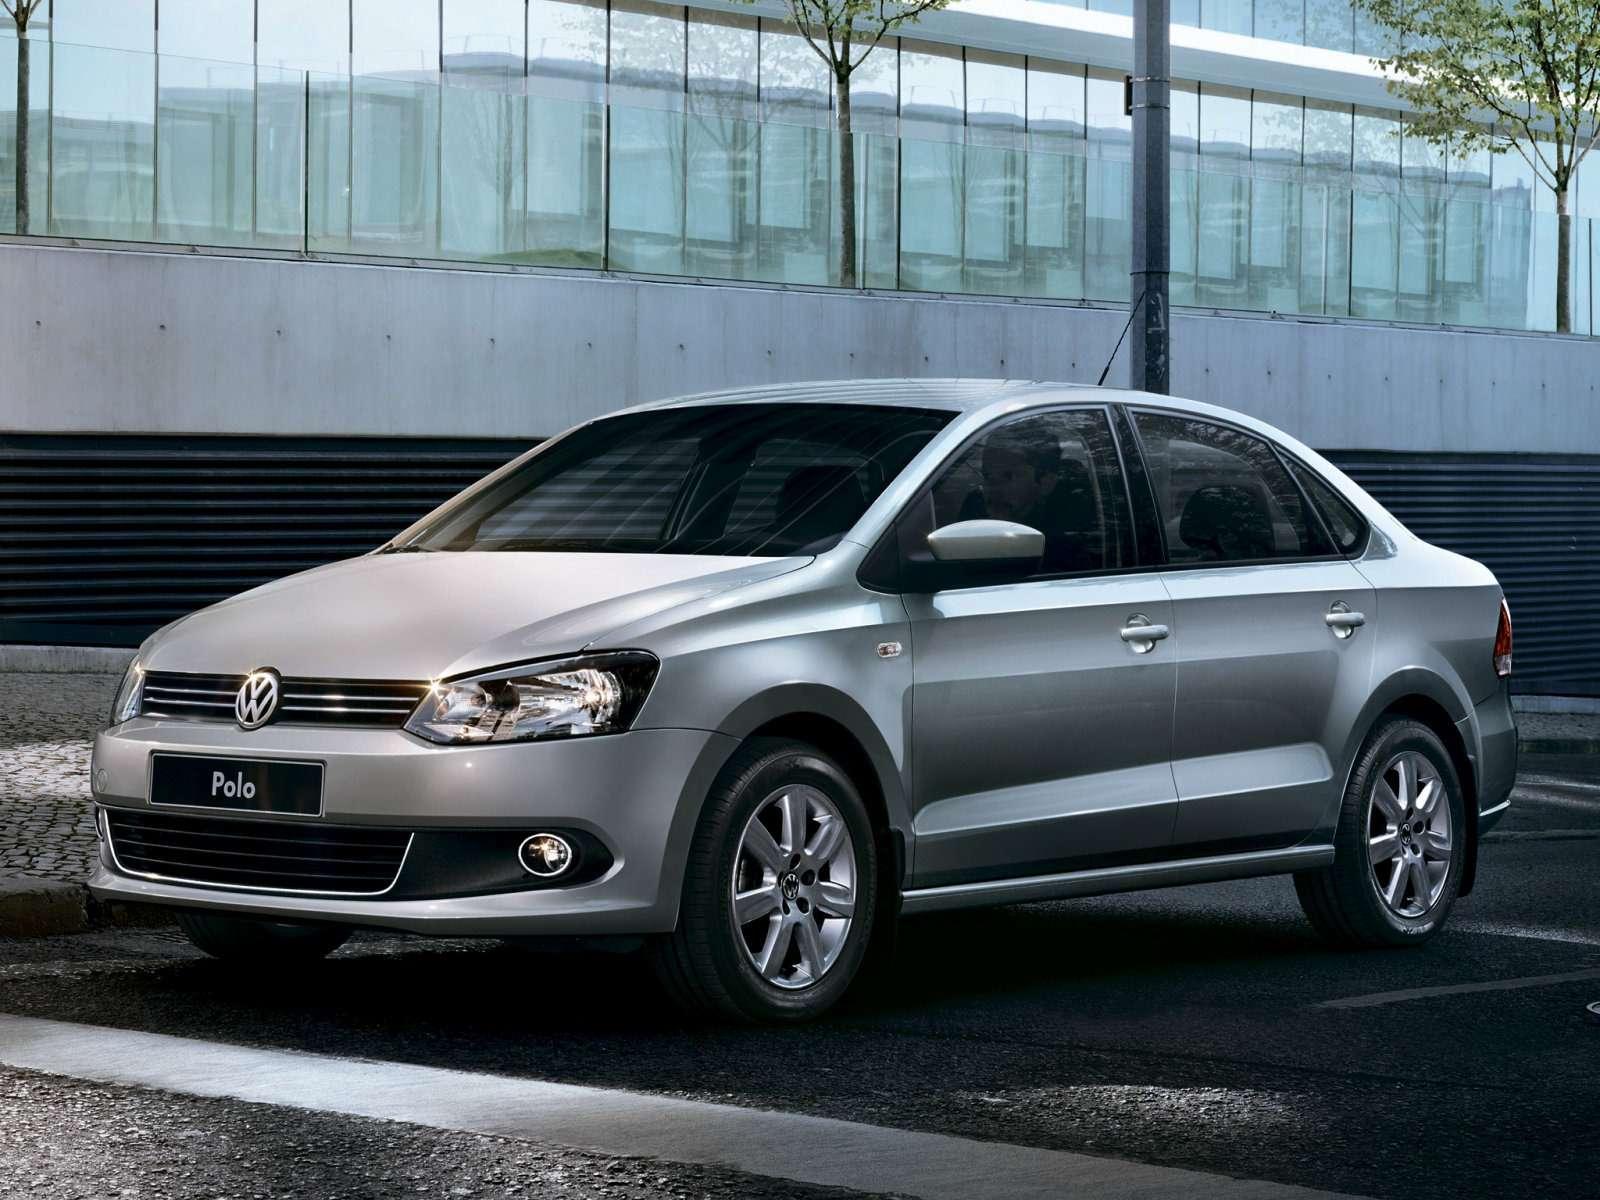 Volkswagen_Polo_Sedan_2010